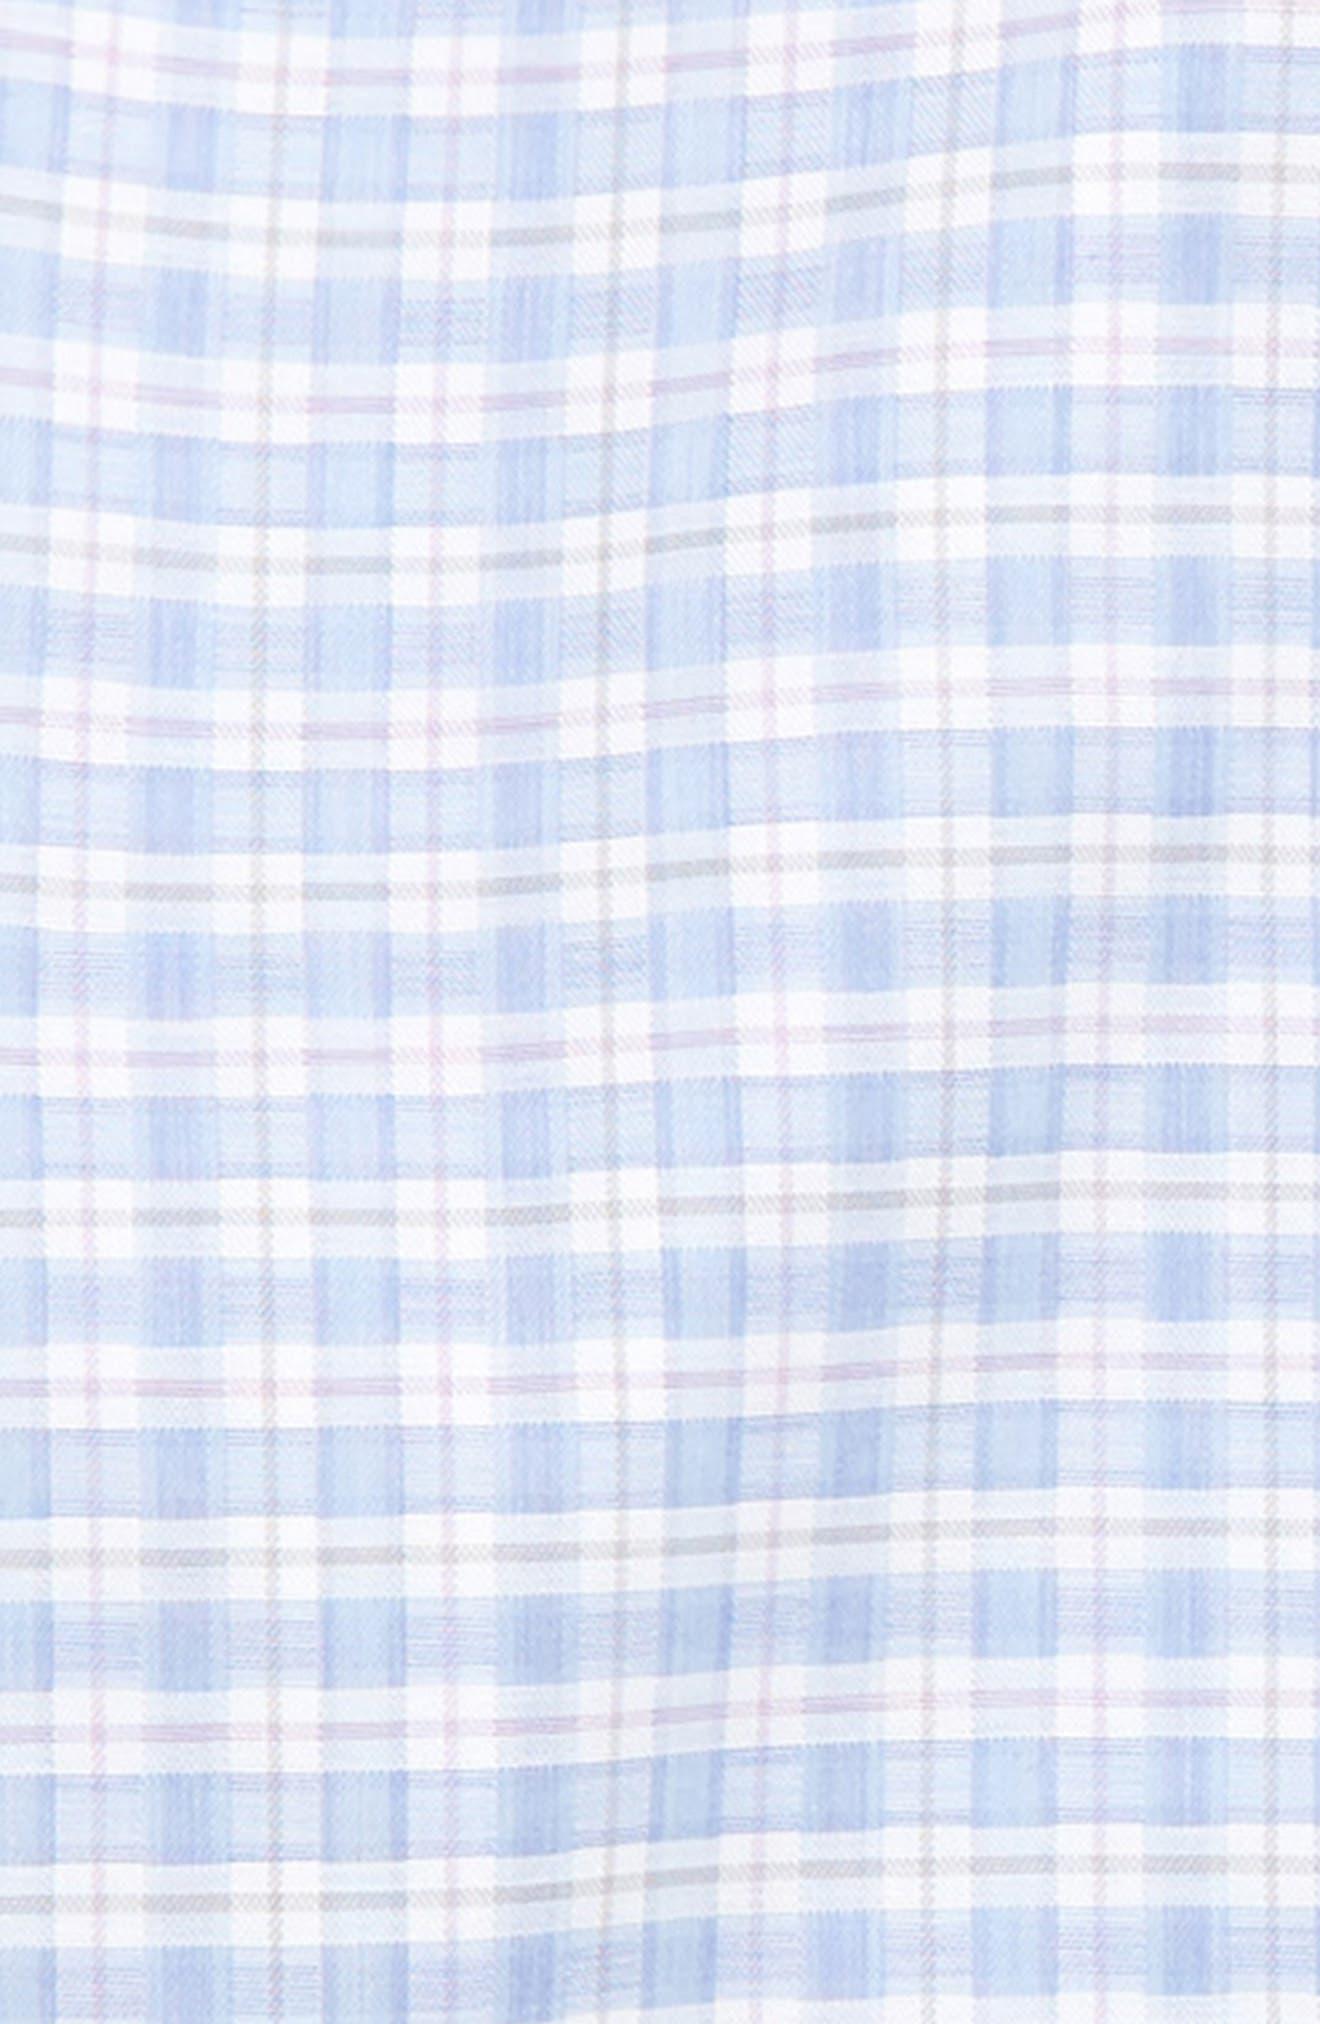 MICHAEL KORS, Plaid Dress Shirt, Alternate thumbnail 2, color, BLUE/ PINK